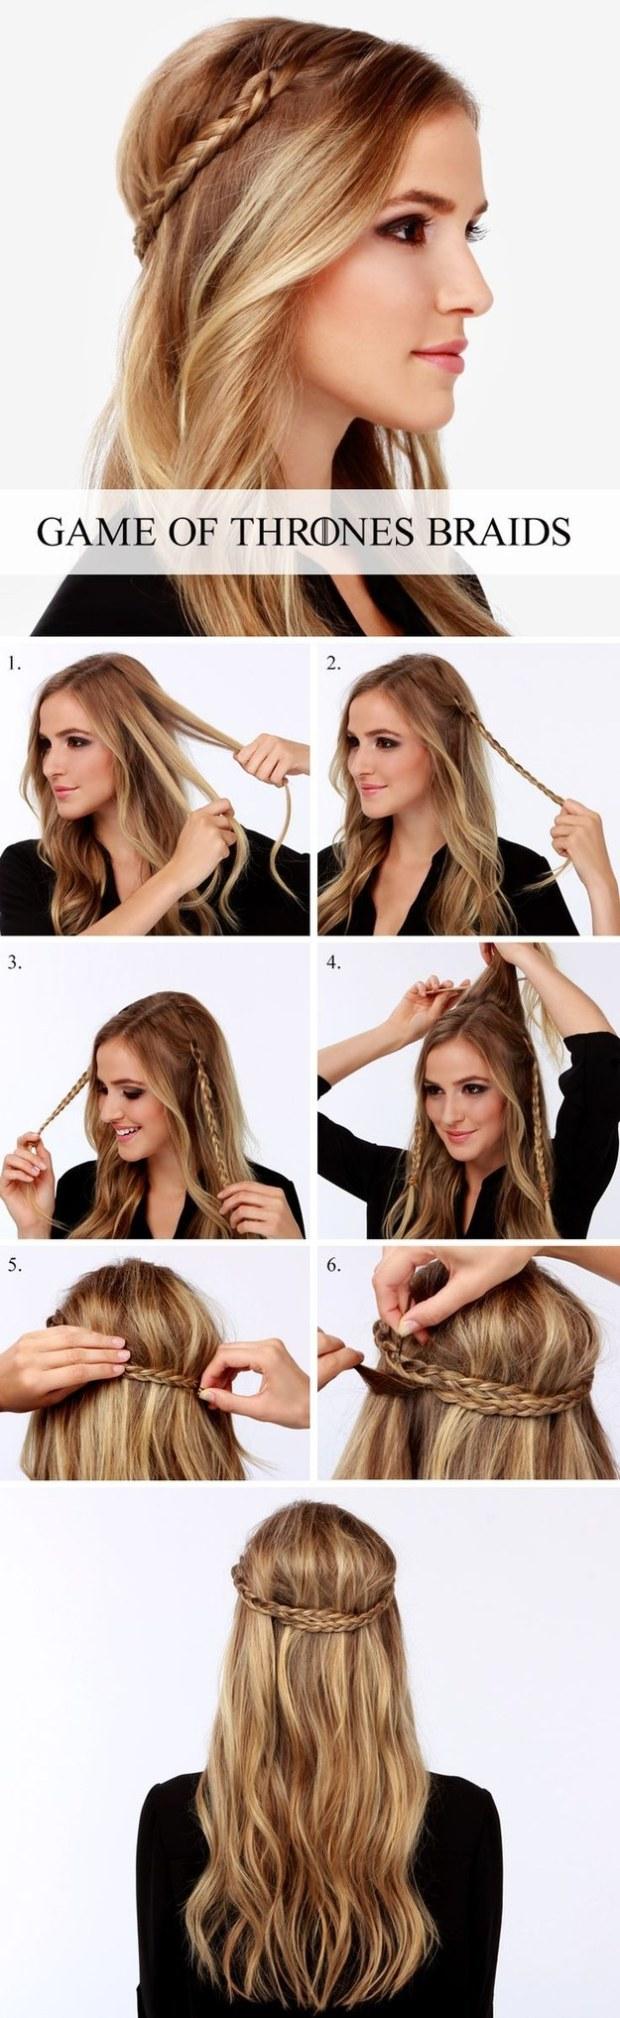 Game of Thrones inspired diy braids wedding hairstyle